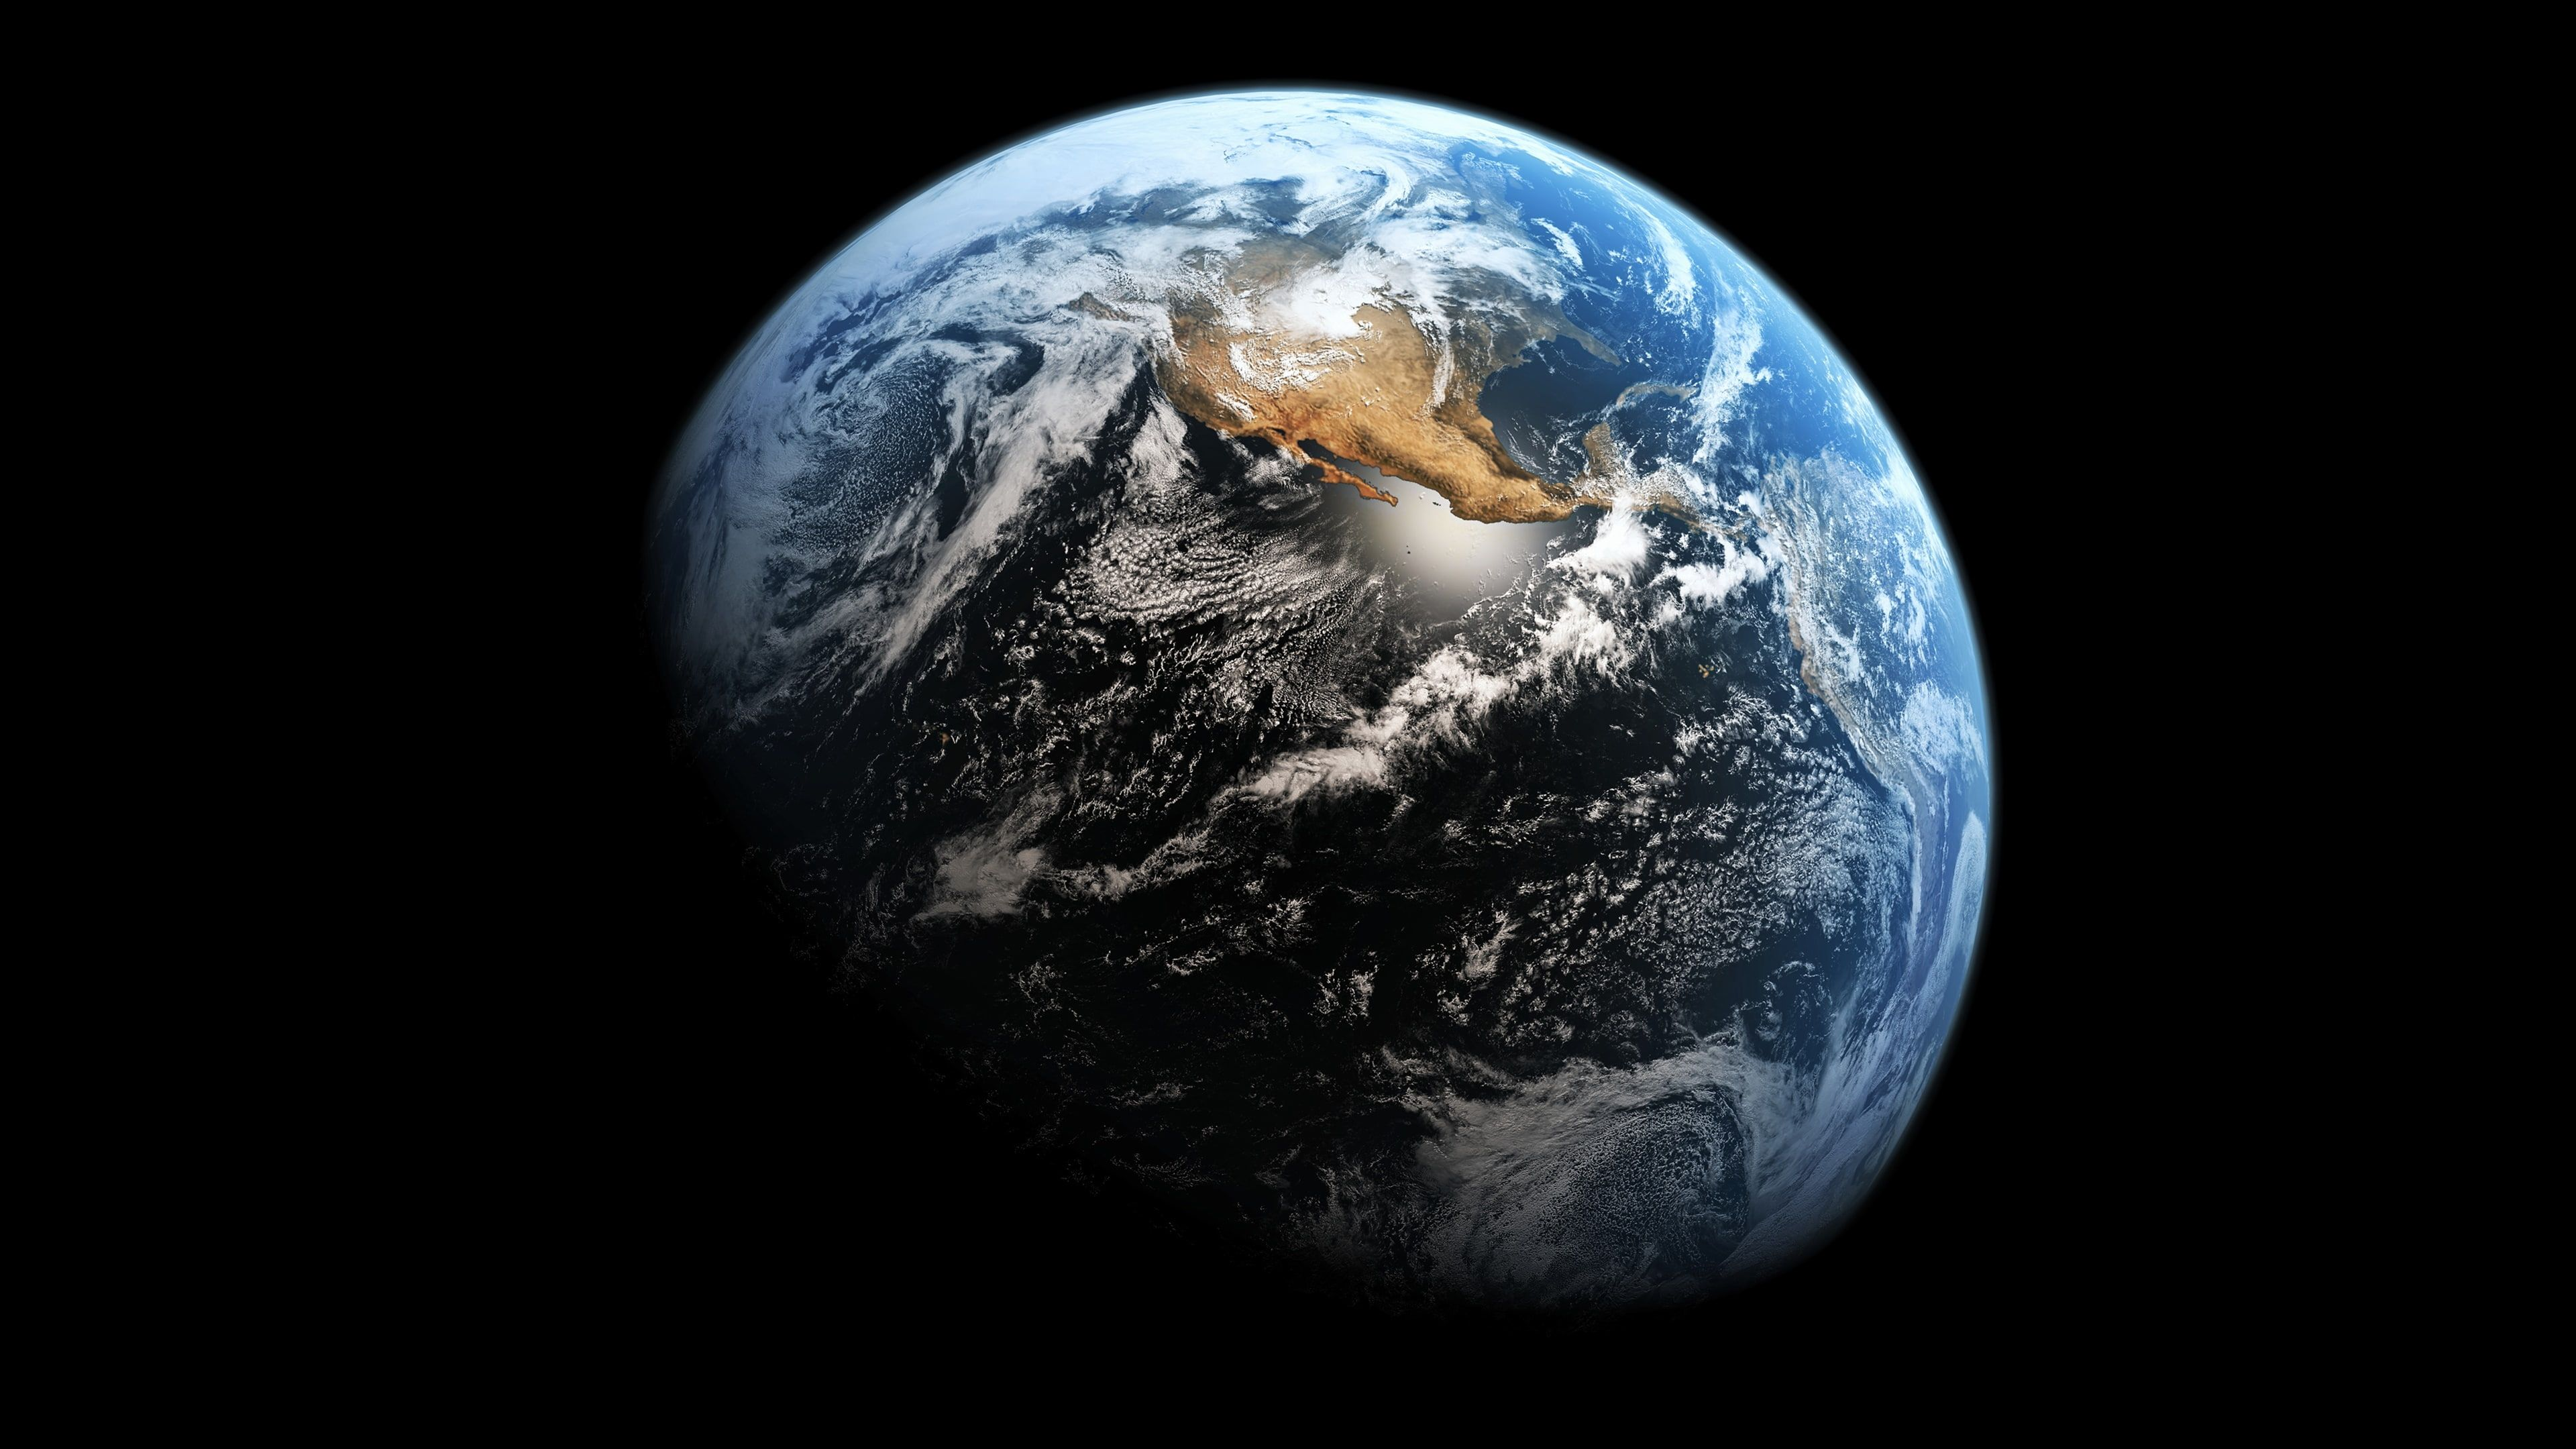 Planet Earth World Blue Marble Space Globe 4k Wallpaper Hdwallpaper Desktop Hintergrundbild Weltraum Earth And Space Hintergrund Fur Macbook Air